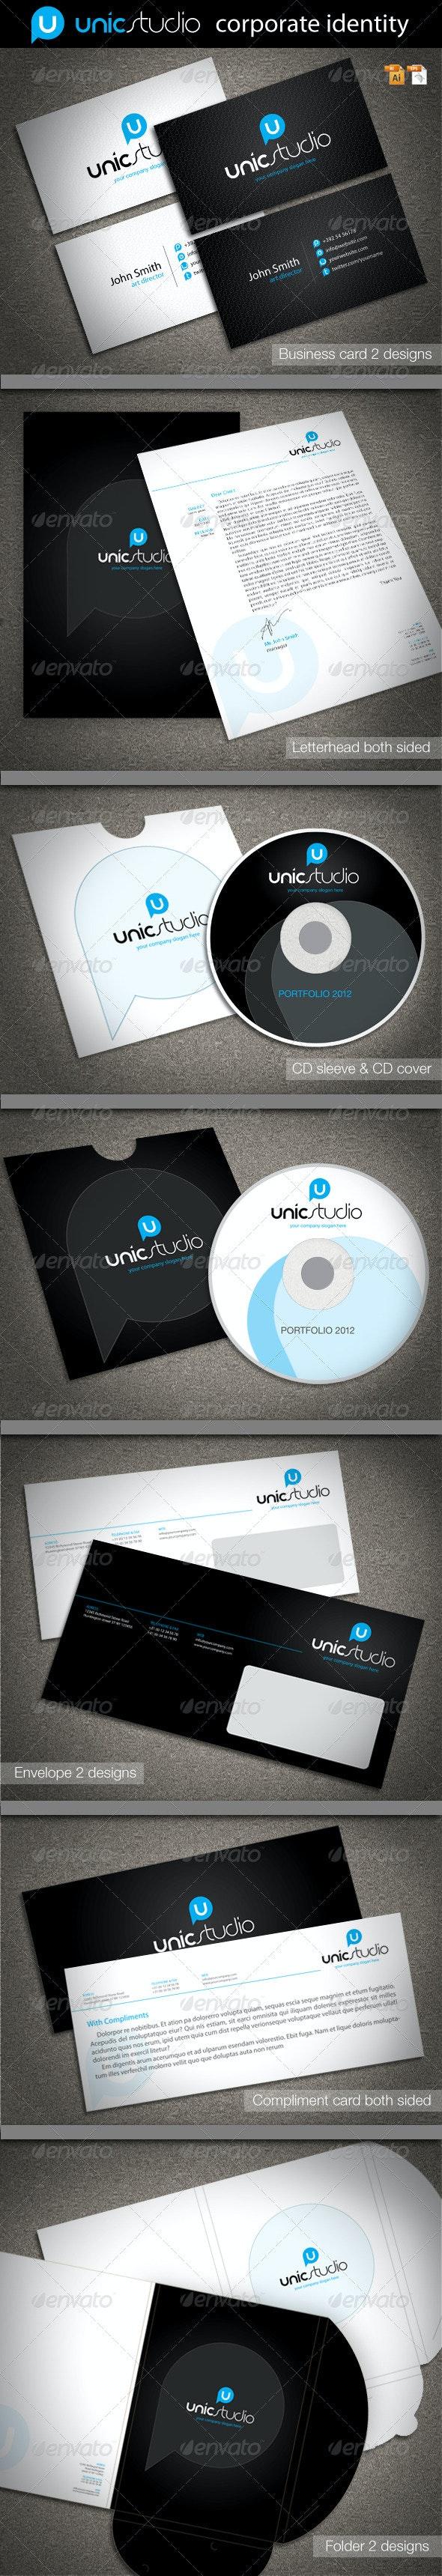 Unic Studio Corporate Identity - Stationery Print Templates